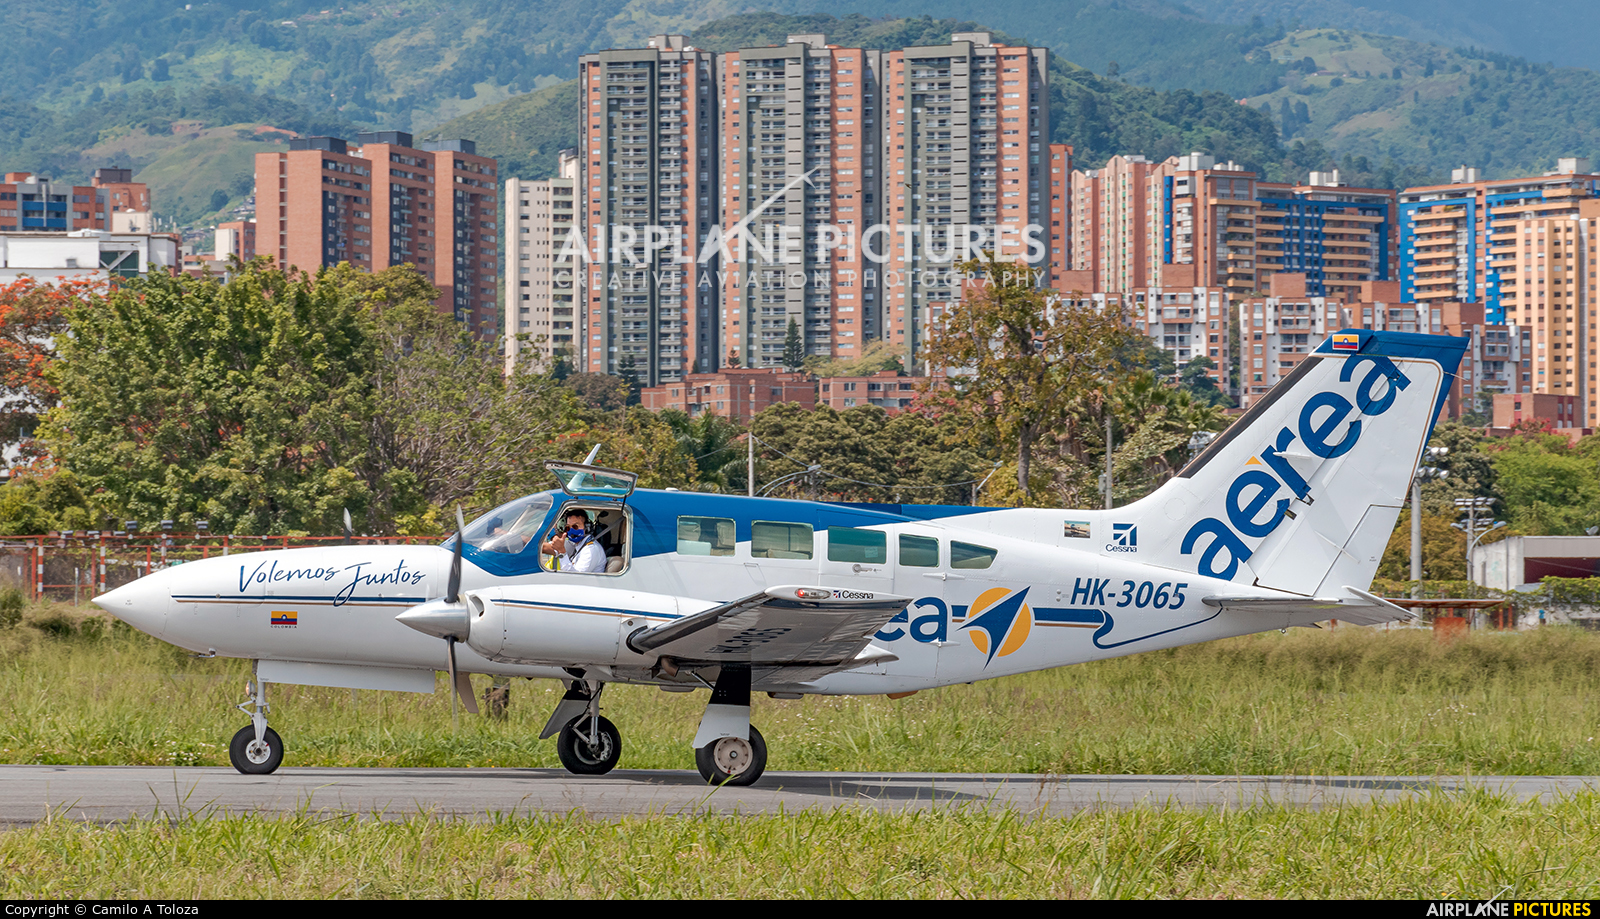 Aeroejecutivos de Antioquia HK-3065 aircraft at Medellin - Olaya Herrera